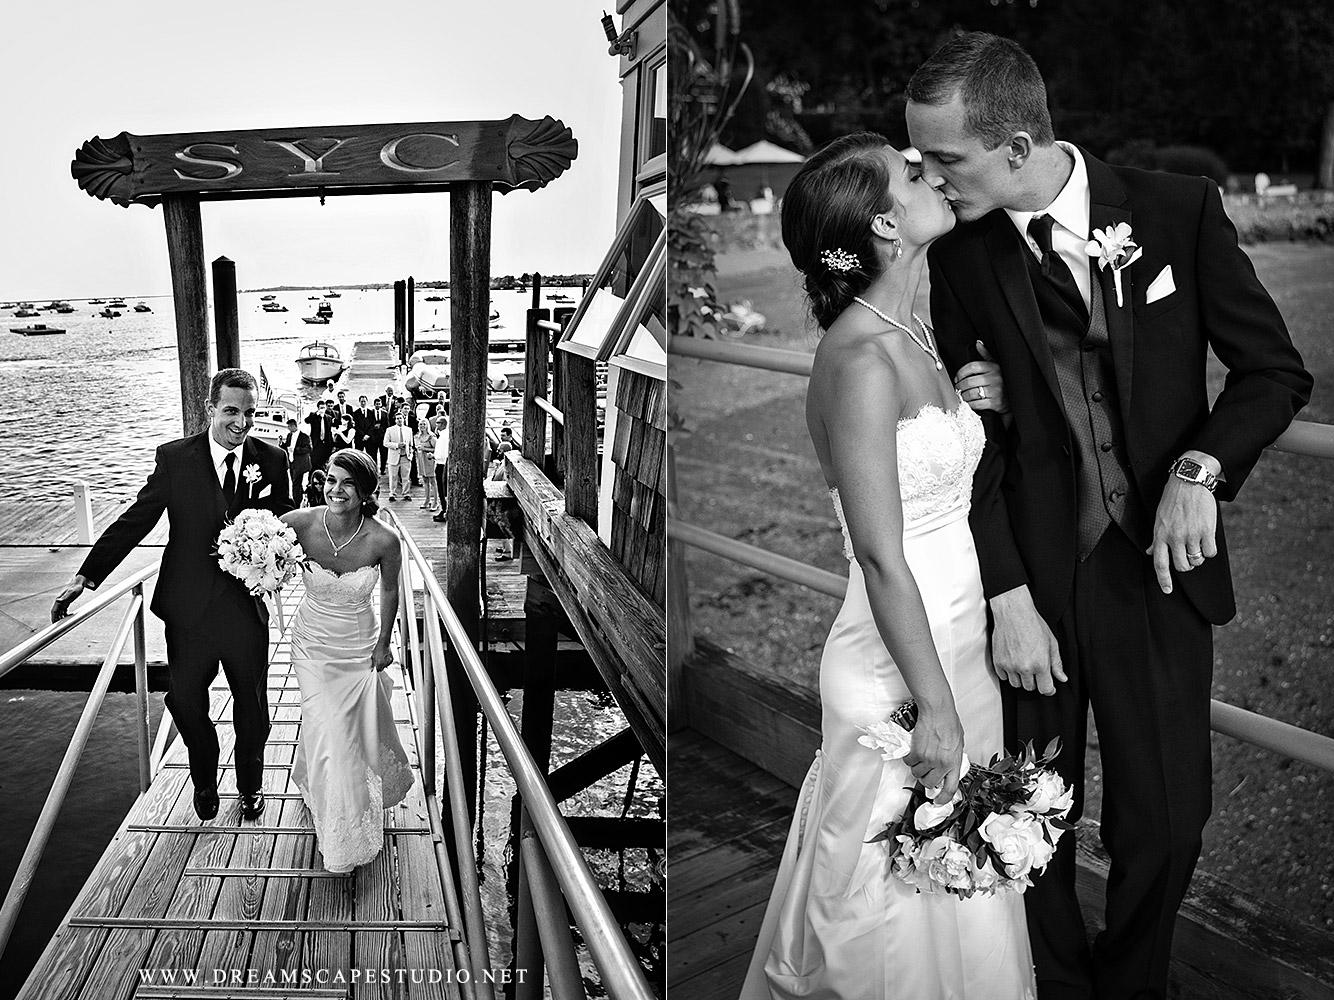 CT_Wedding_Photography_Liz_Justin_18LiJu.jpg